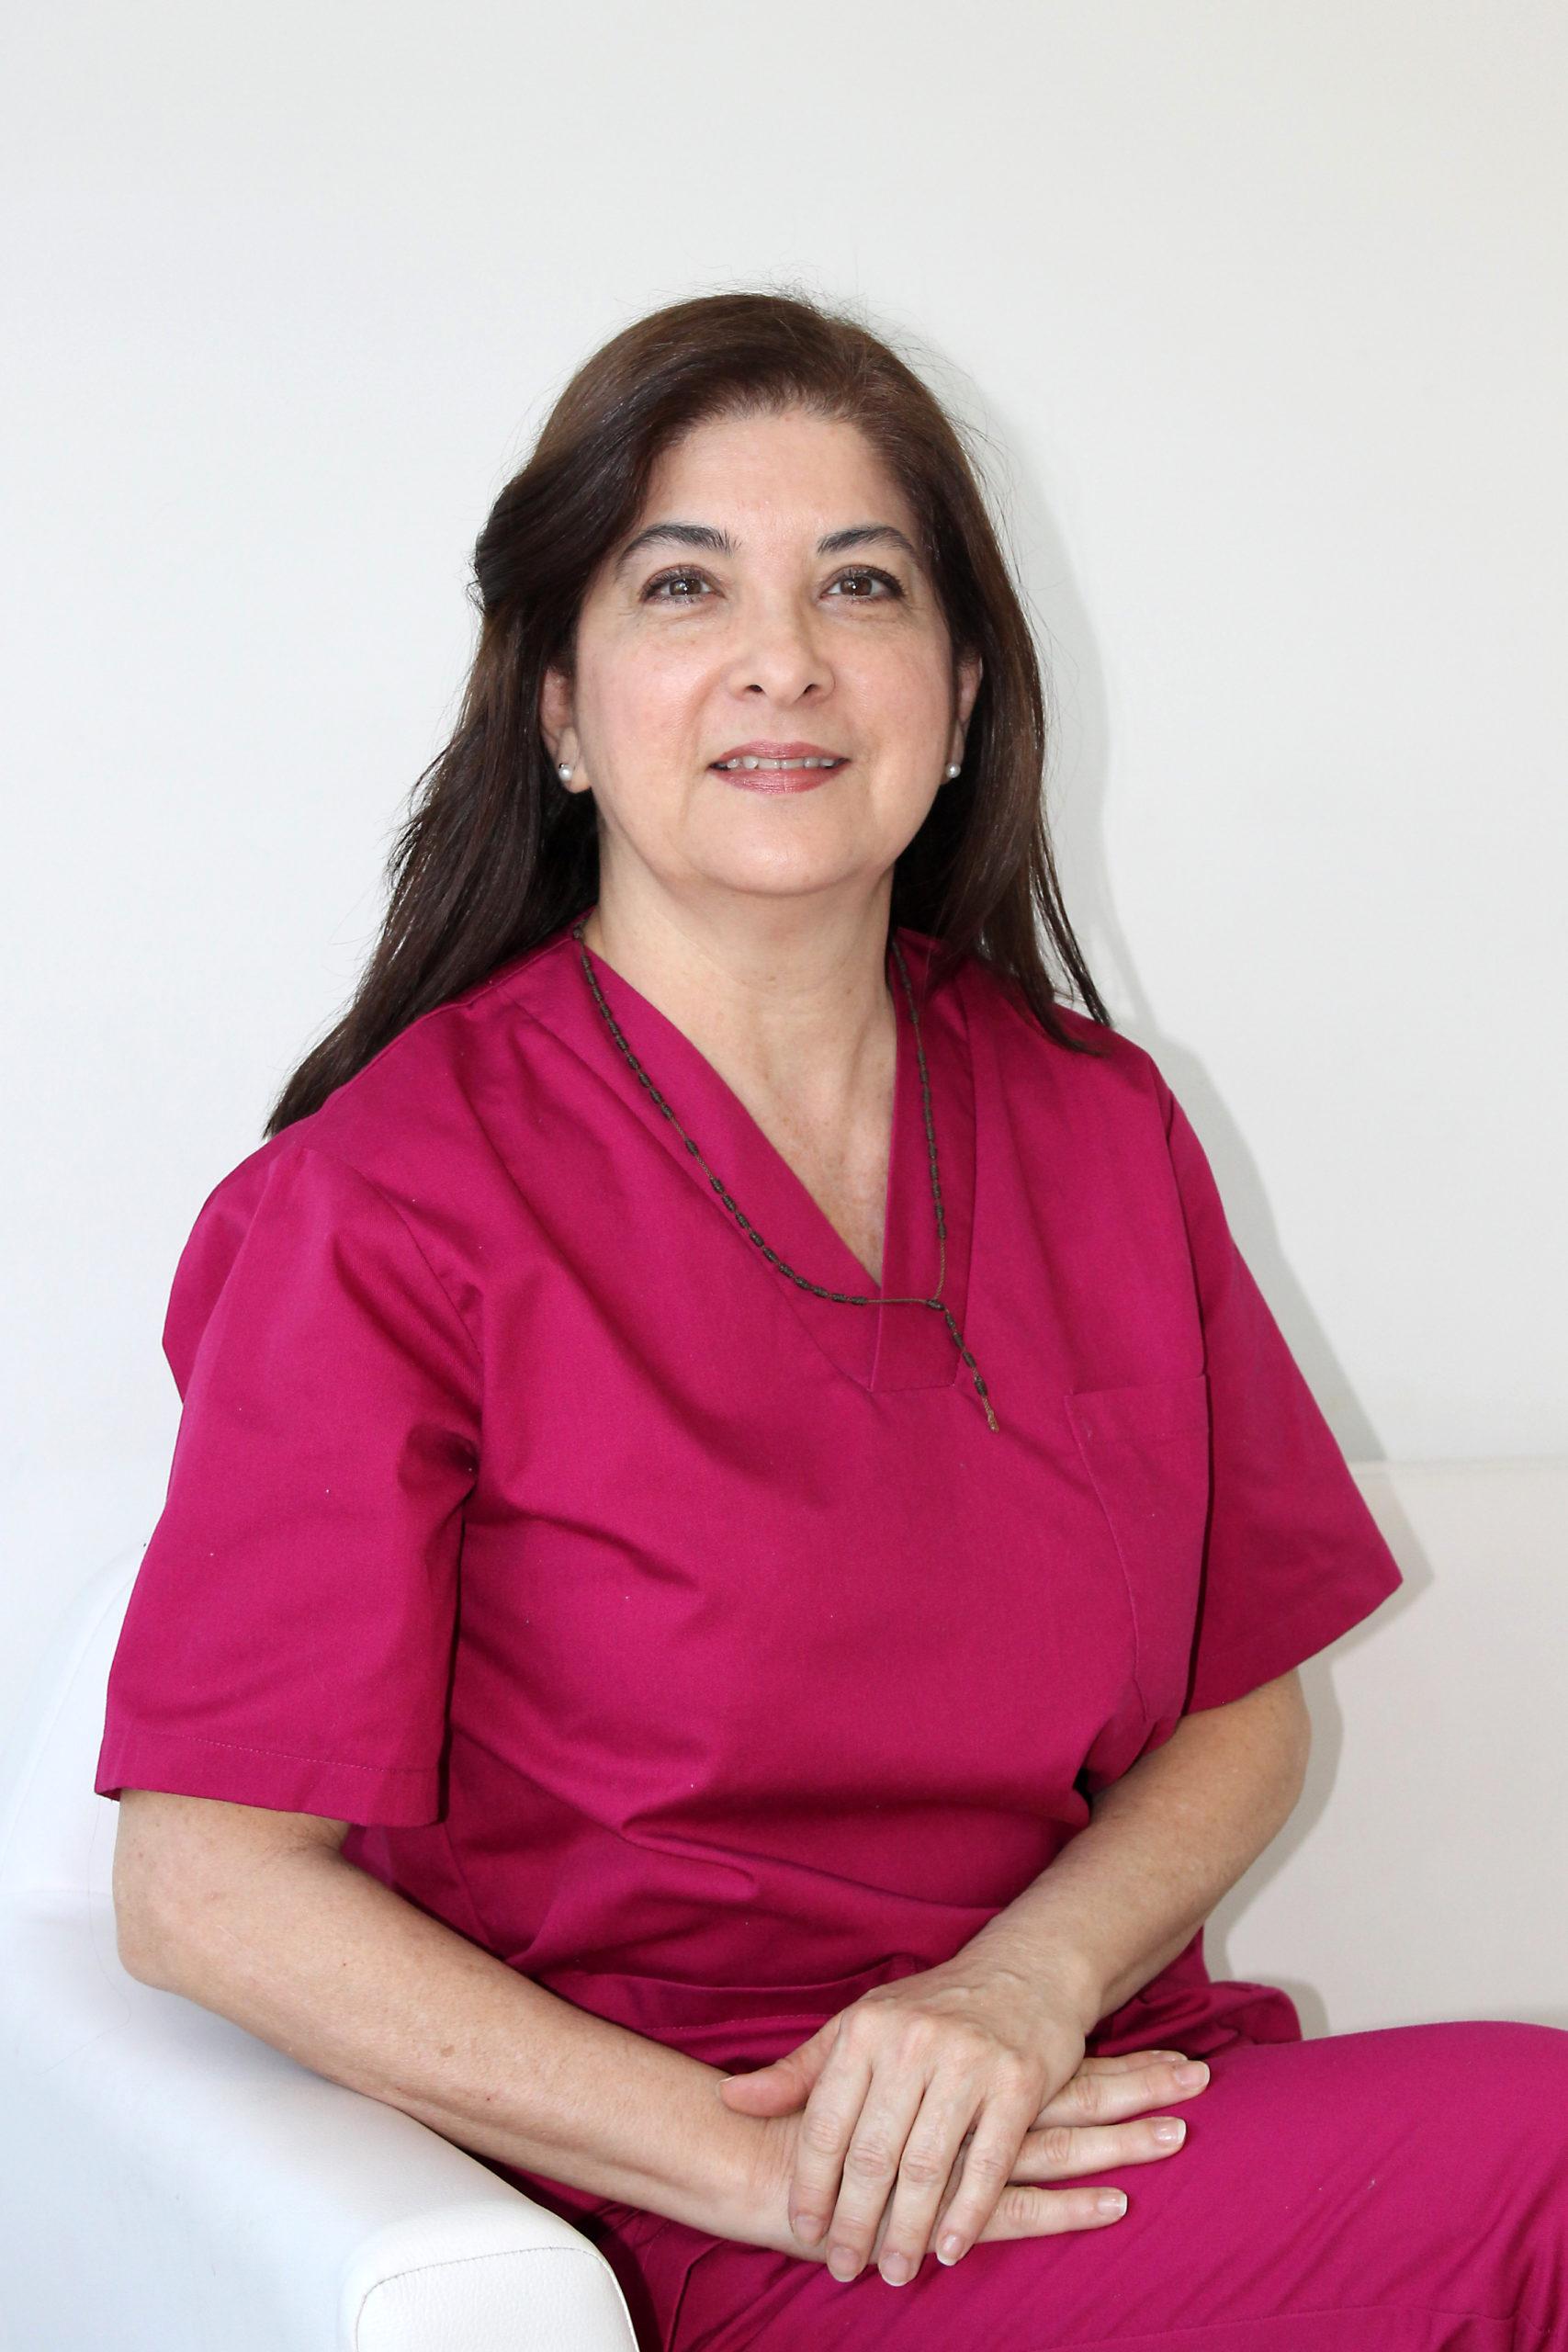 Dra. María Mireya Santos Aguirrezabala